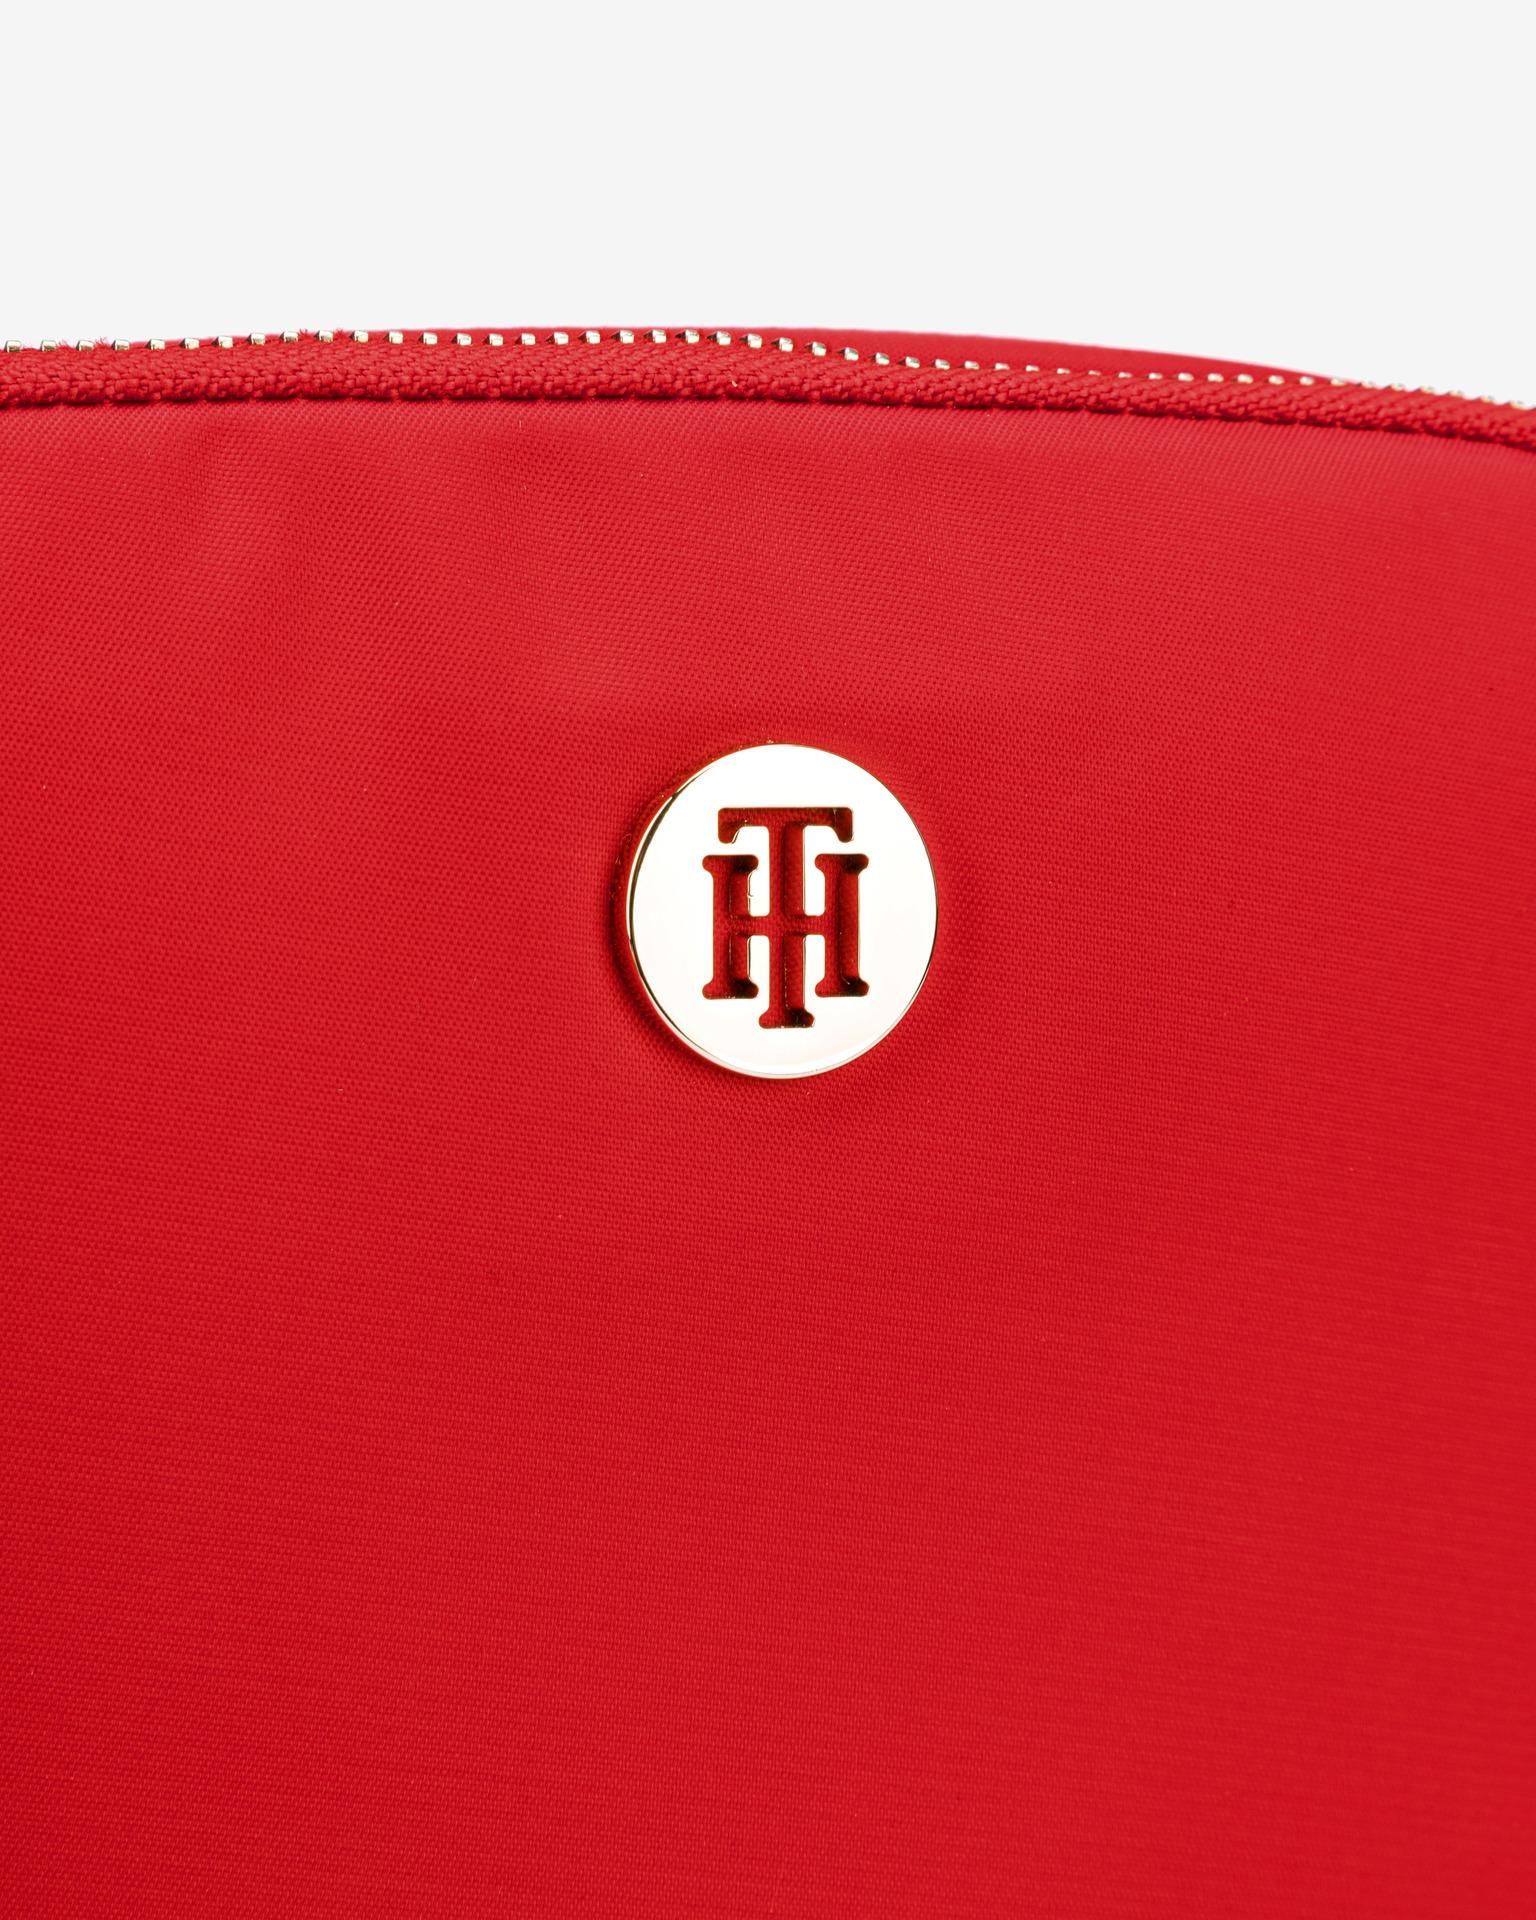 Tommy Hilfiger czerwony crossbody torebka Poppy